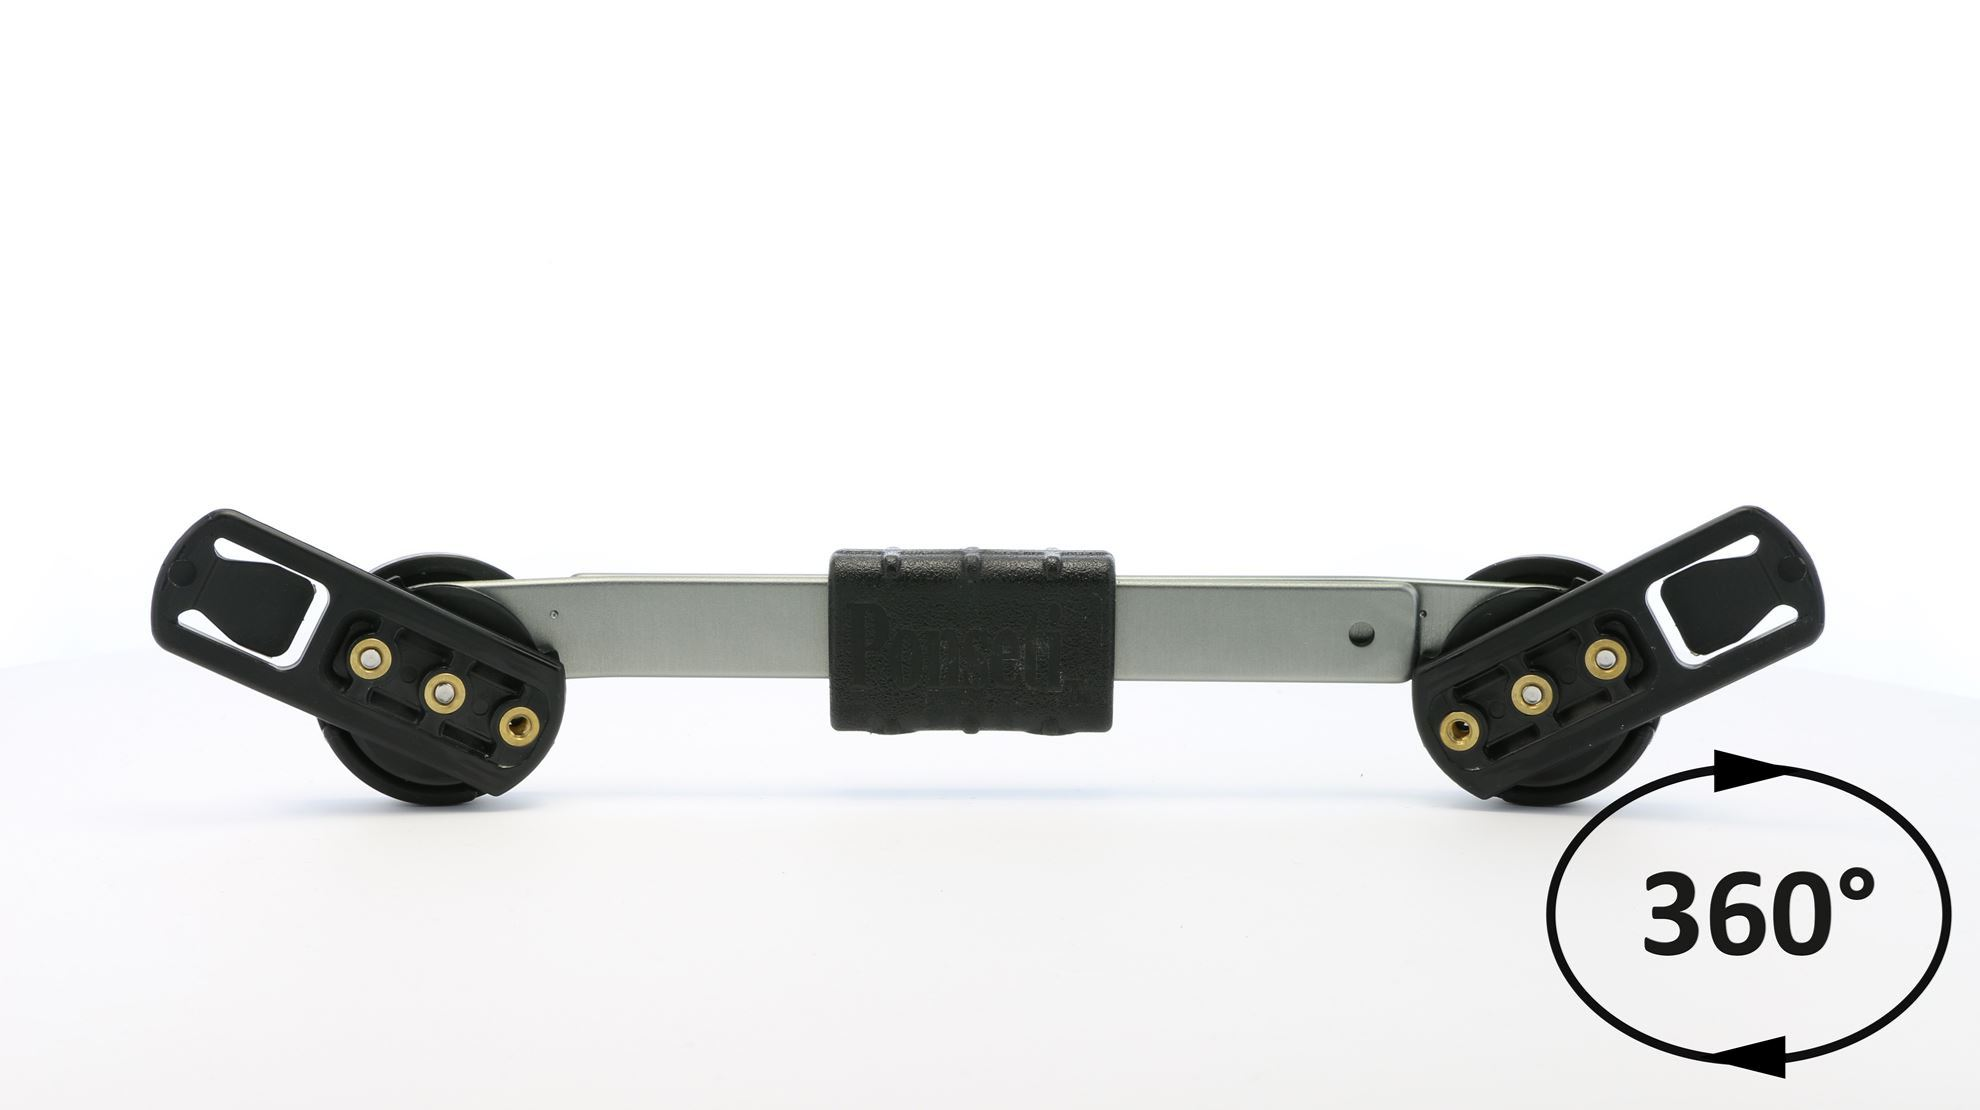 Ponseti Abduction Rotation Bars